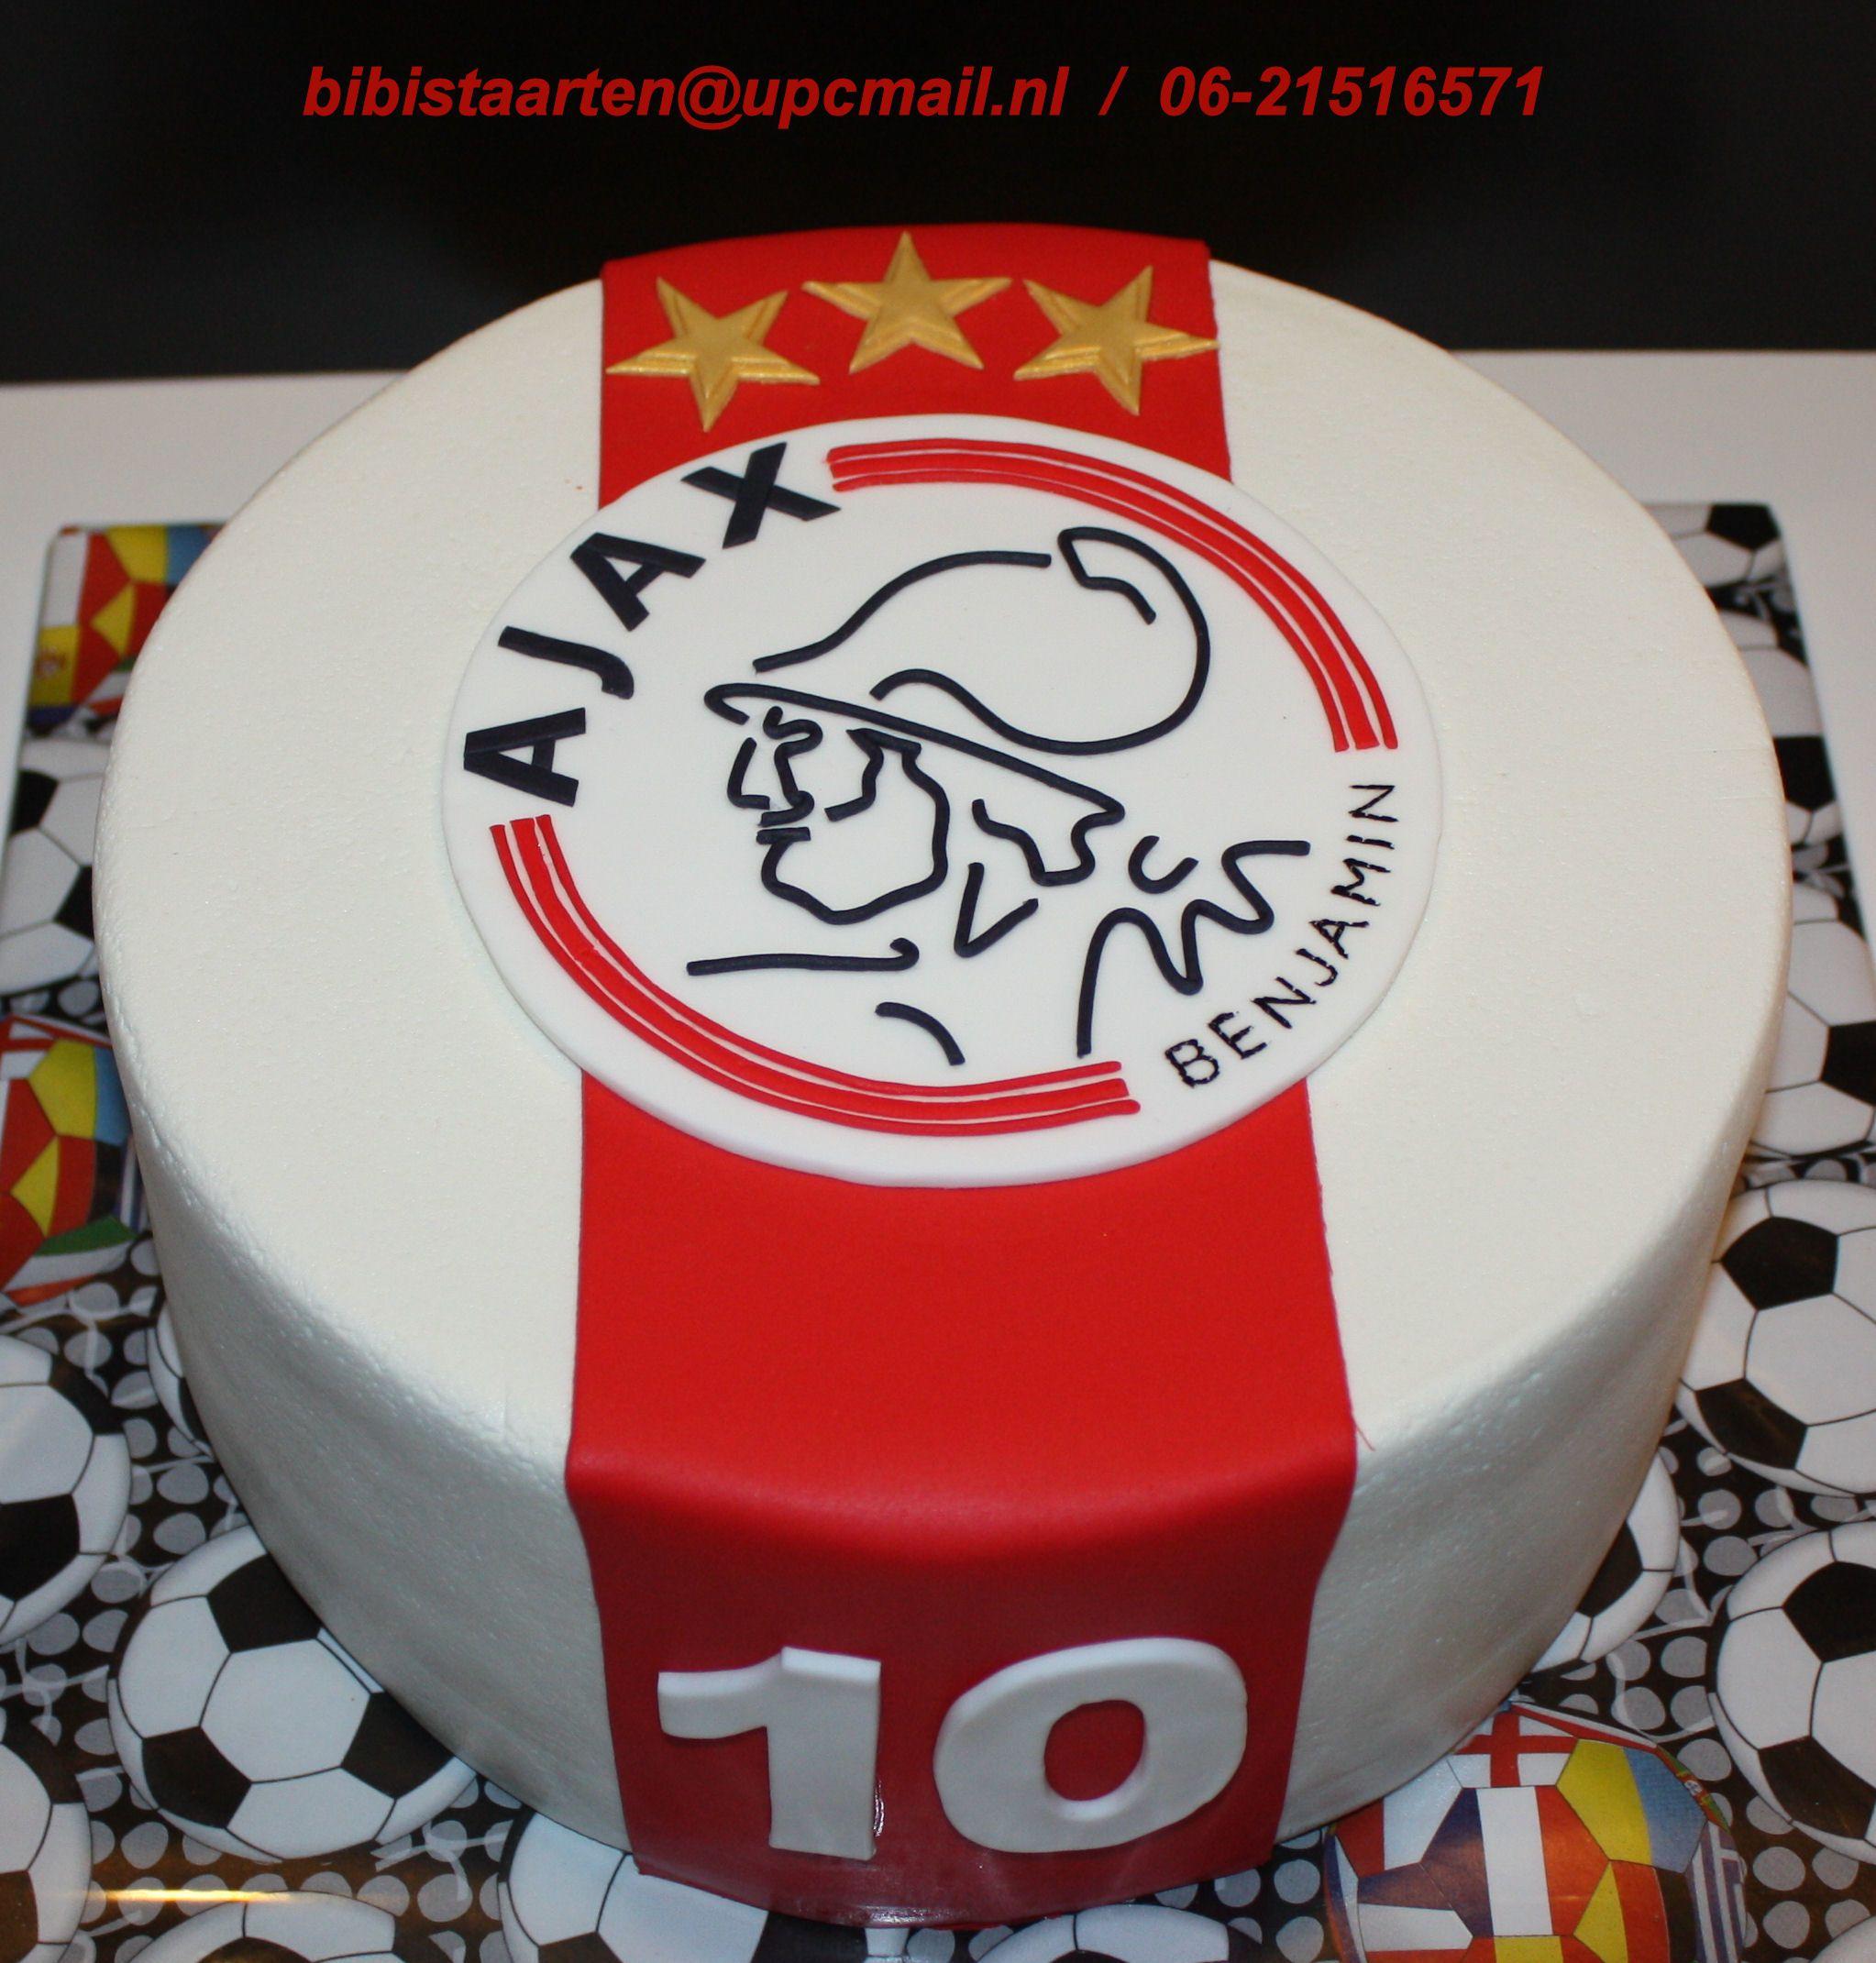 Extreem Ajax Taart / Ajax cake | torty in 2019 - Soccer cake, Birthday &RX93